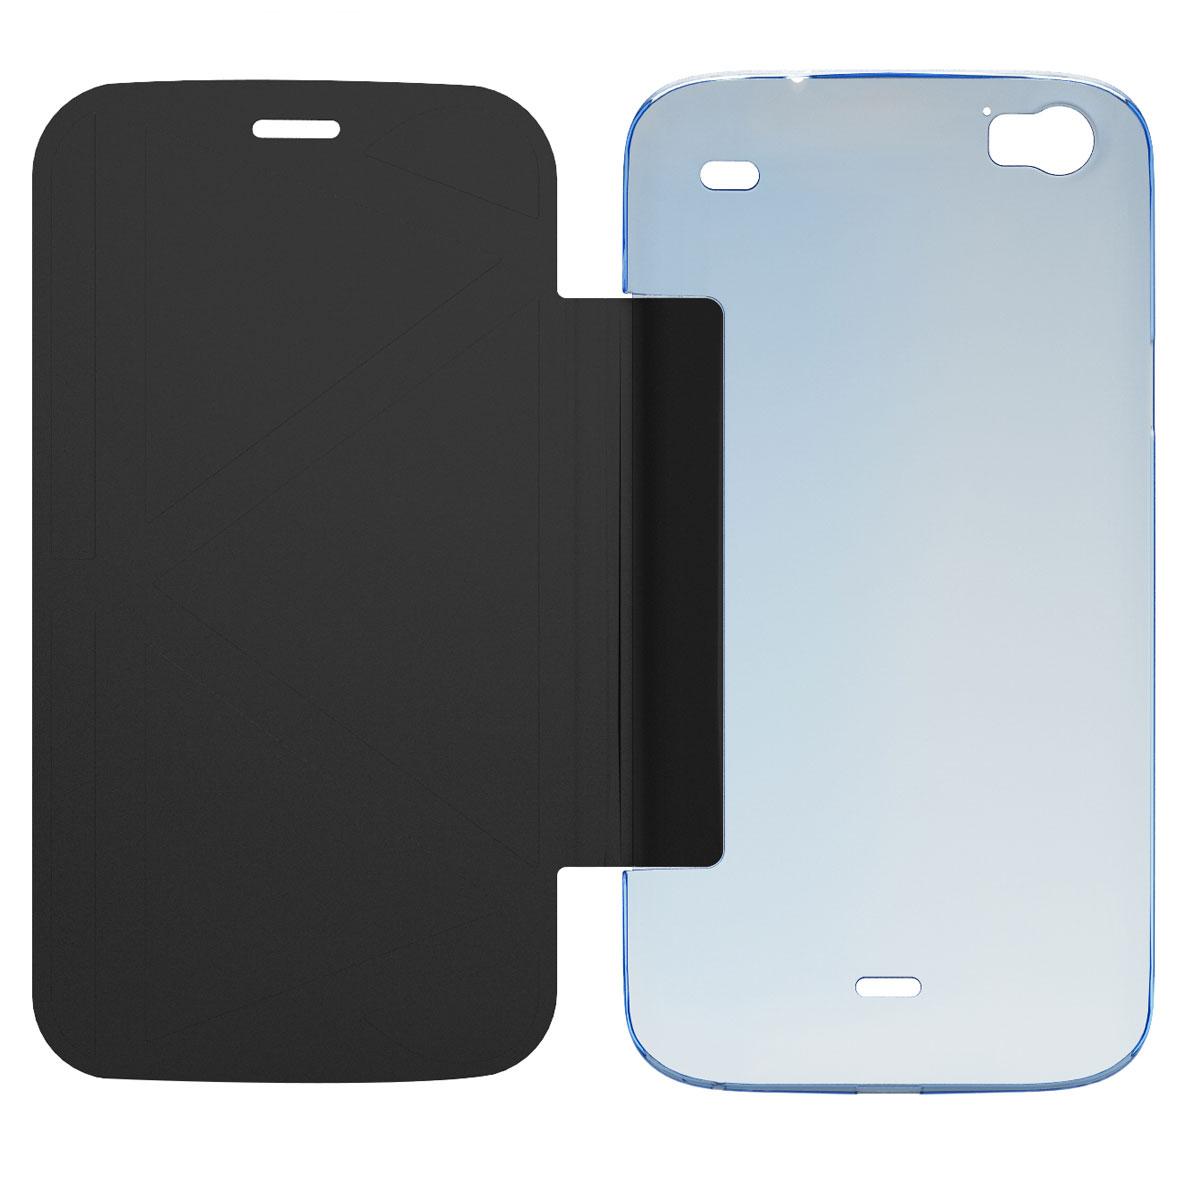 wiko folio coque support darkside bleu etui t l phone wiko sur. Black Bedroom Furniture Sets. Home Design Ideas